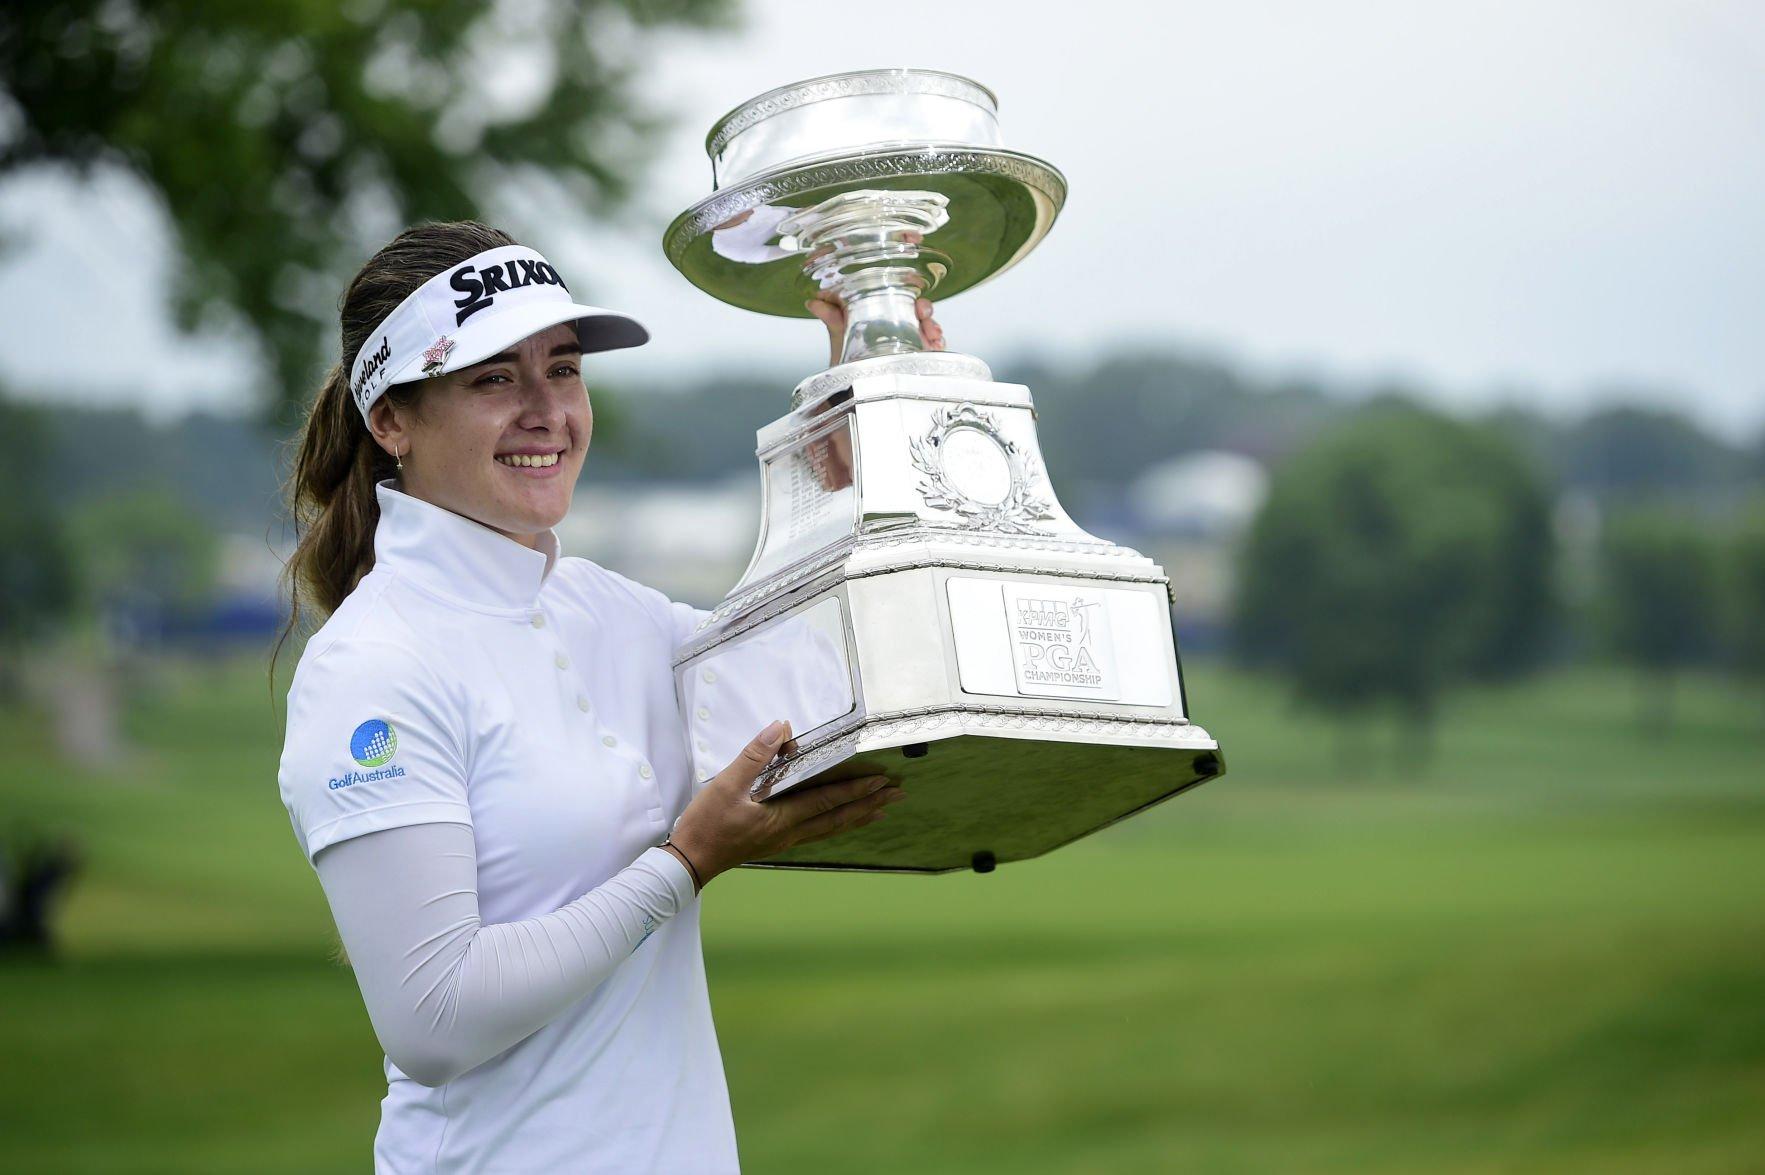 LPGA: KPMG Womens PGA Championship - Final Round